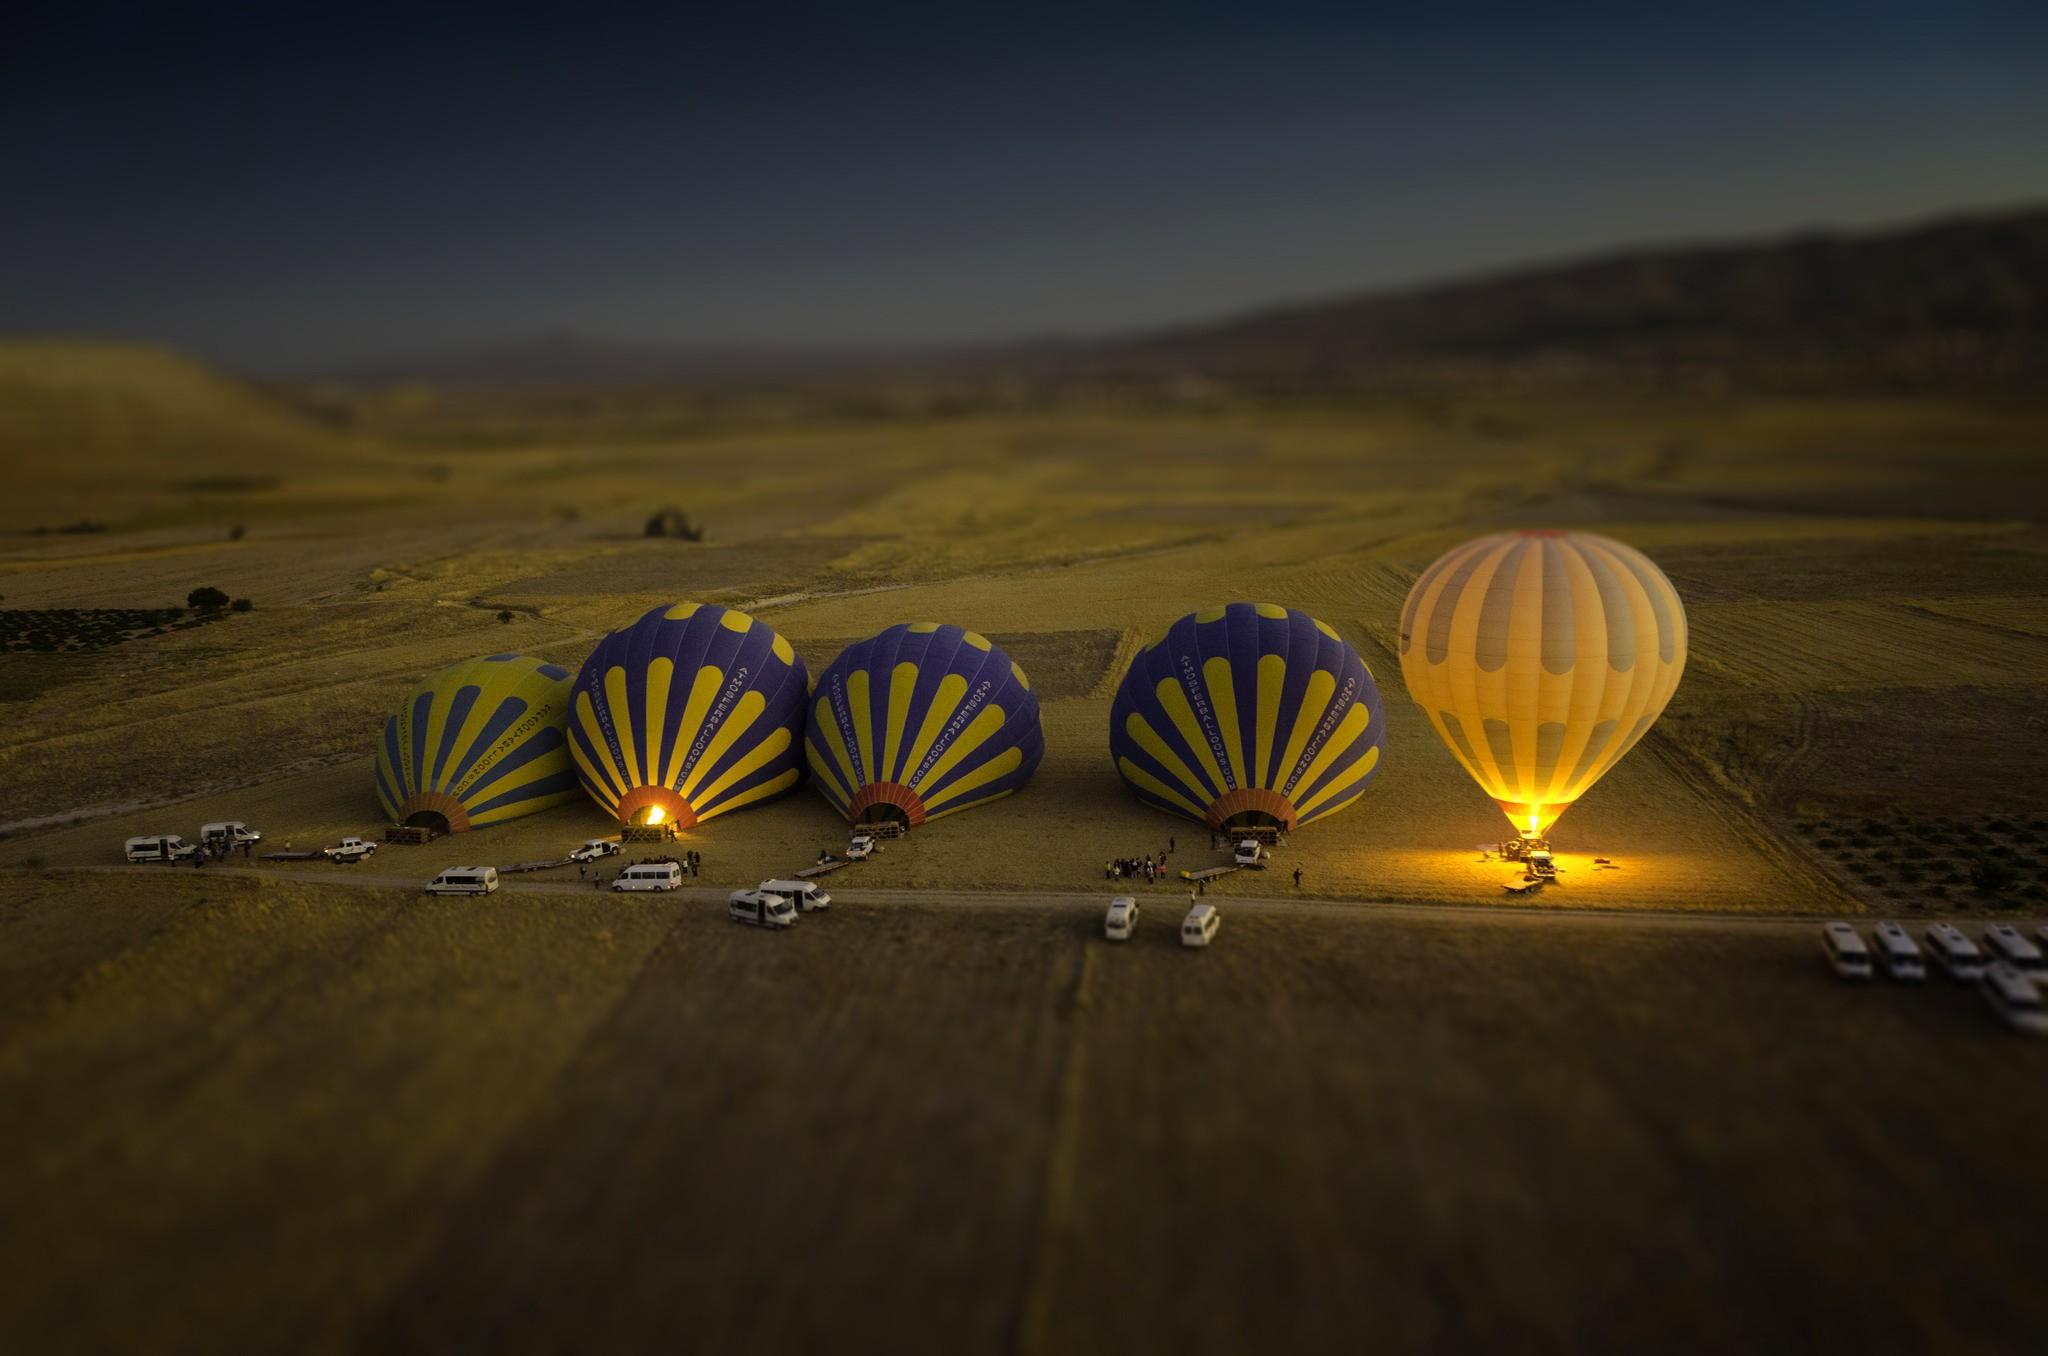 General 2048x1356 hot air balloons landscape tilt shift car field nature group of people hills fire